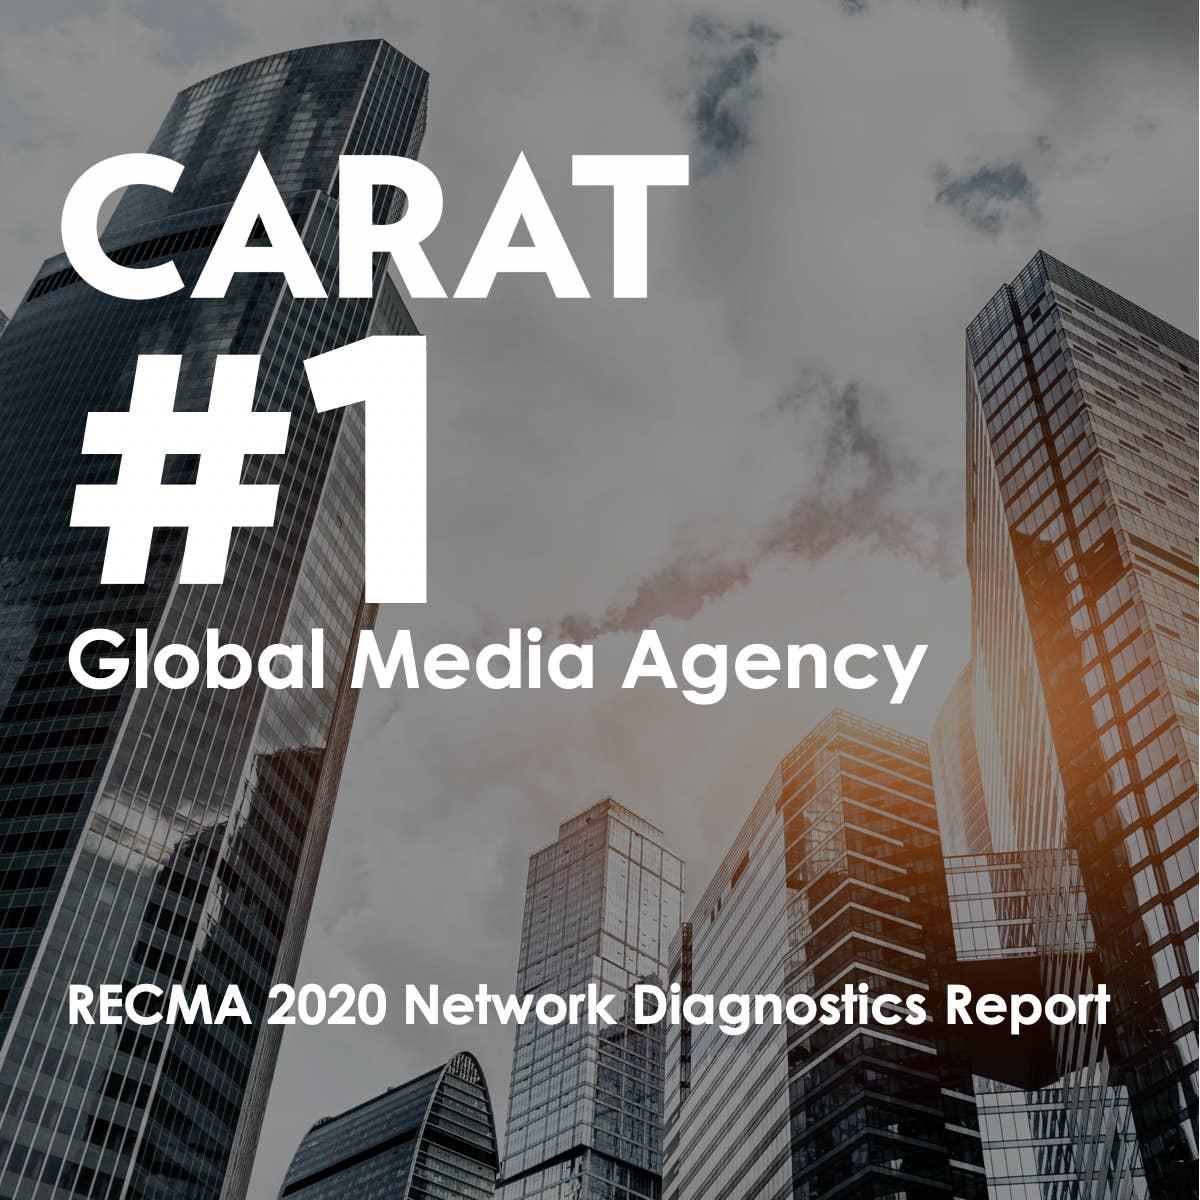 Carat Retains #1 Position in RECMA